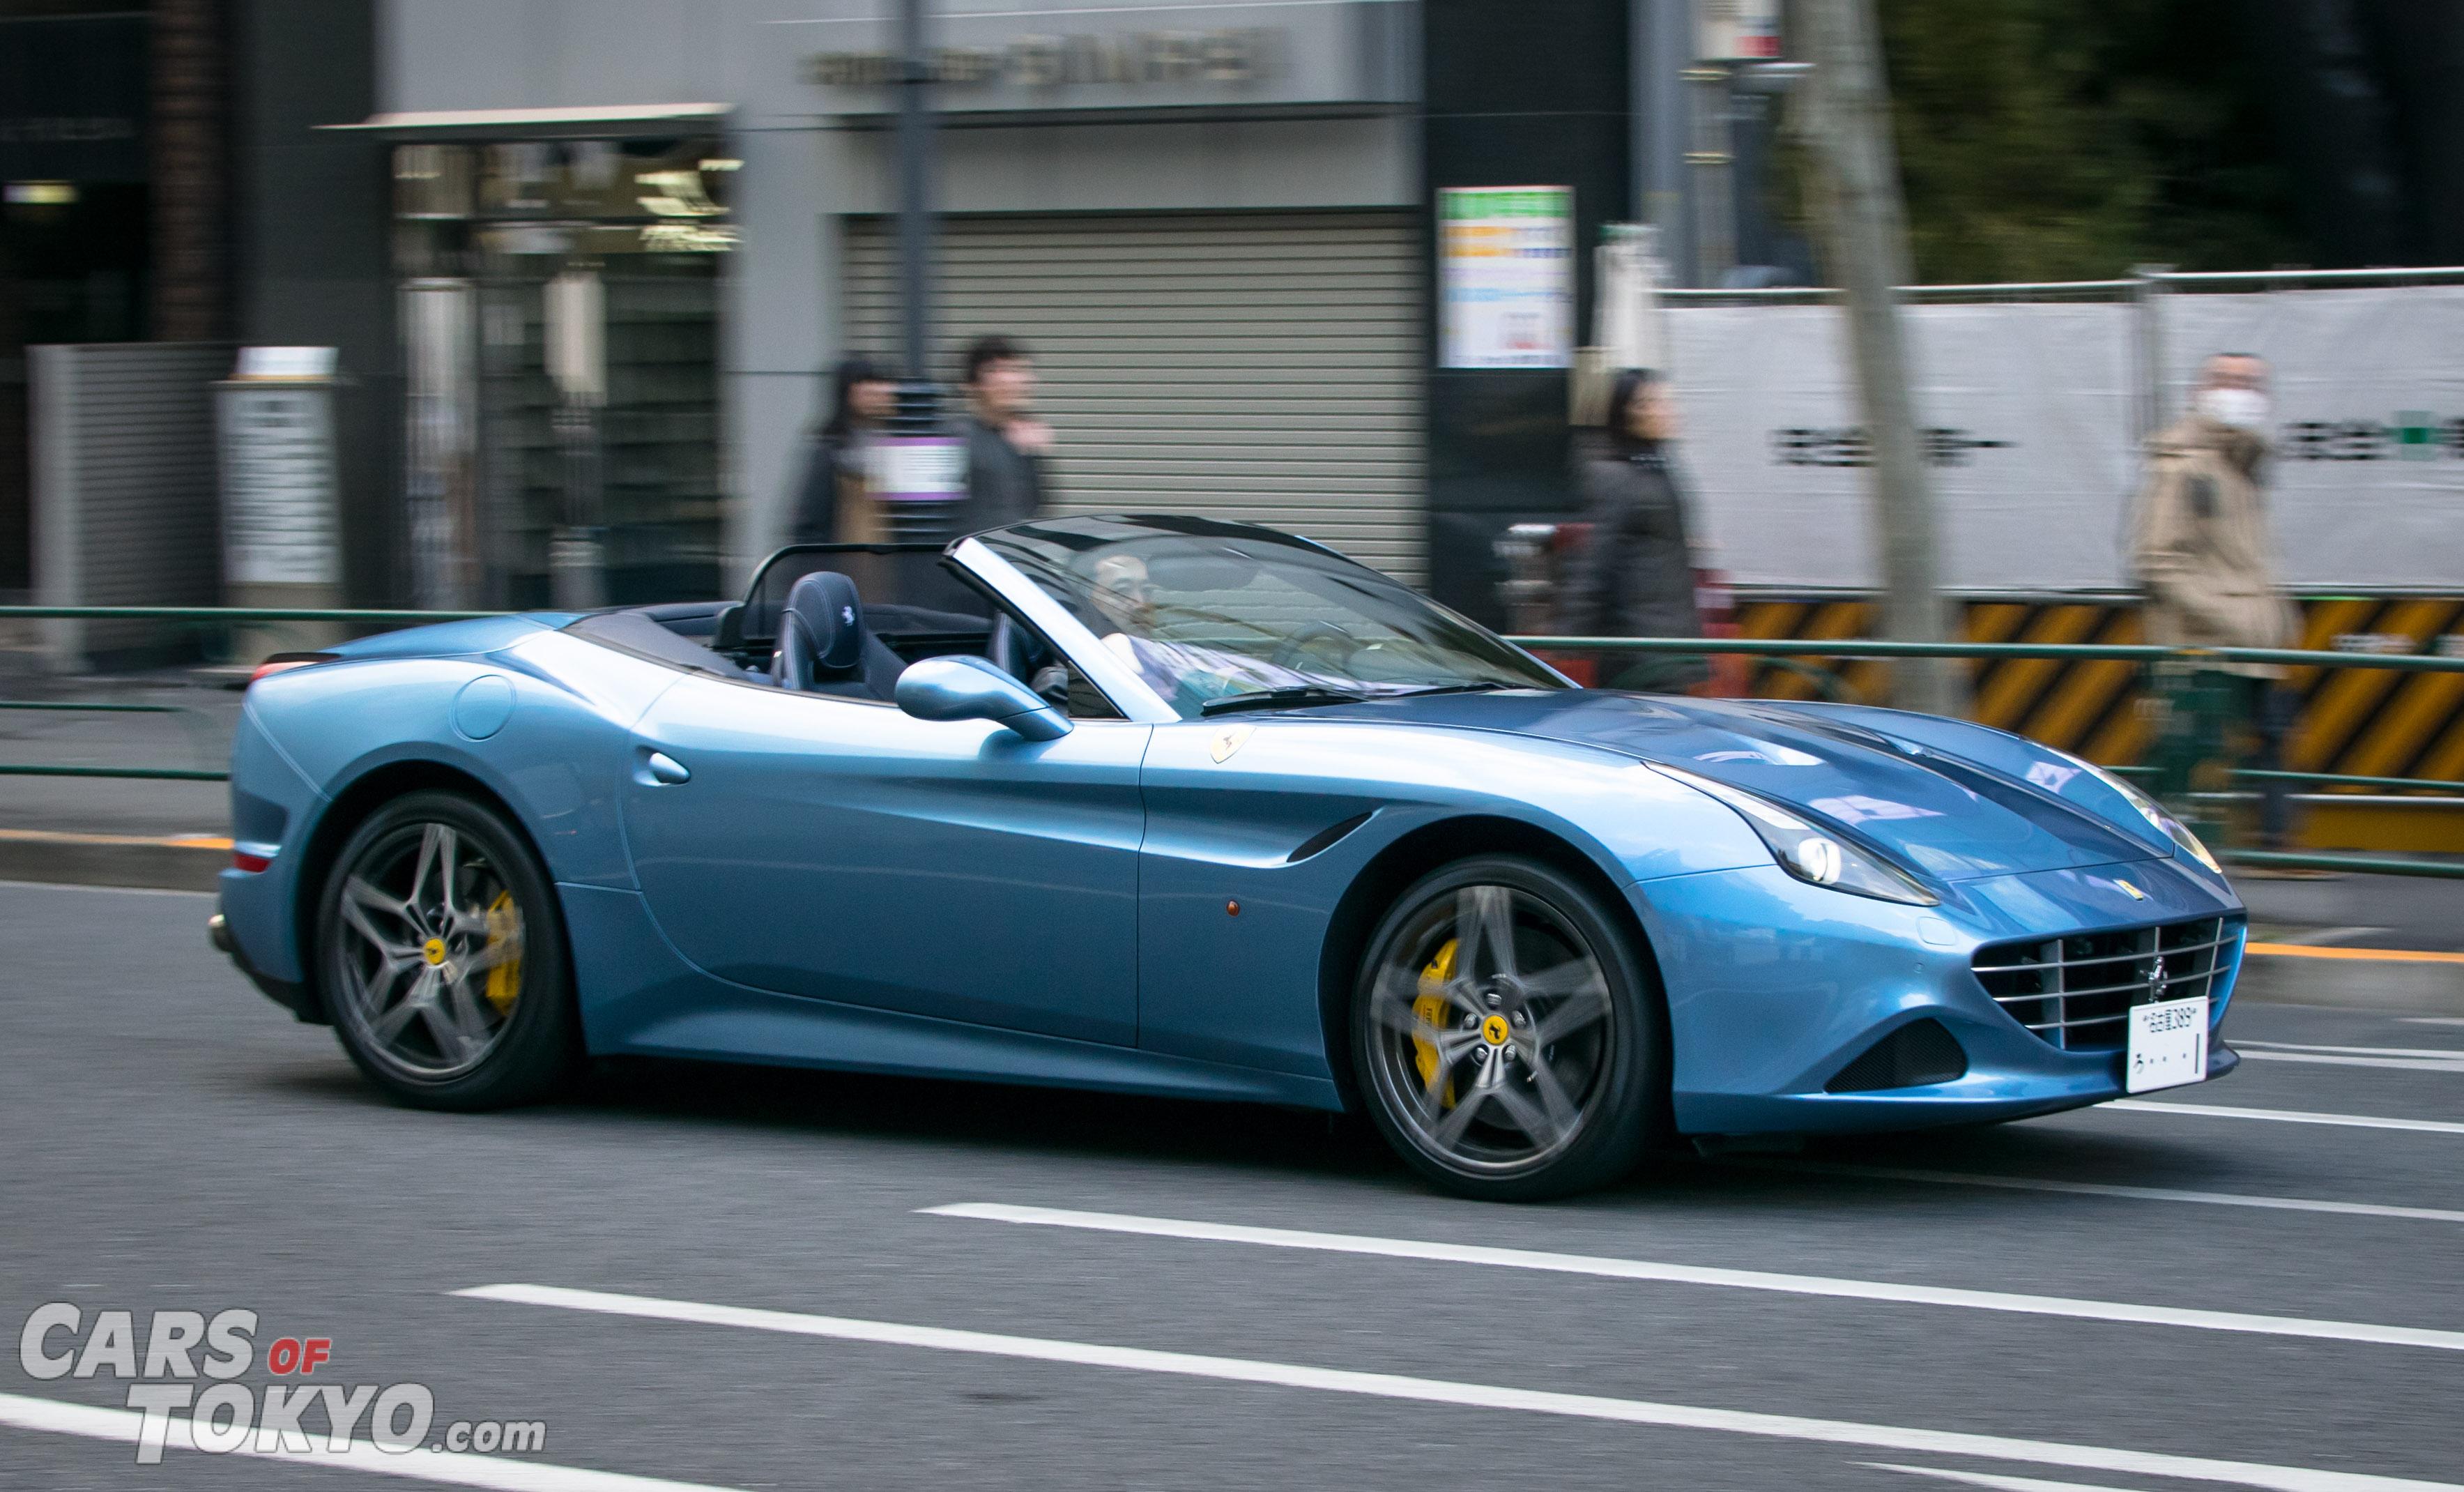 Cars of Tokyo Clean Ferrari California T